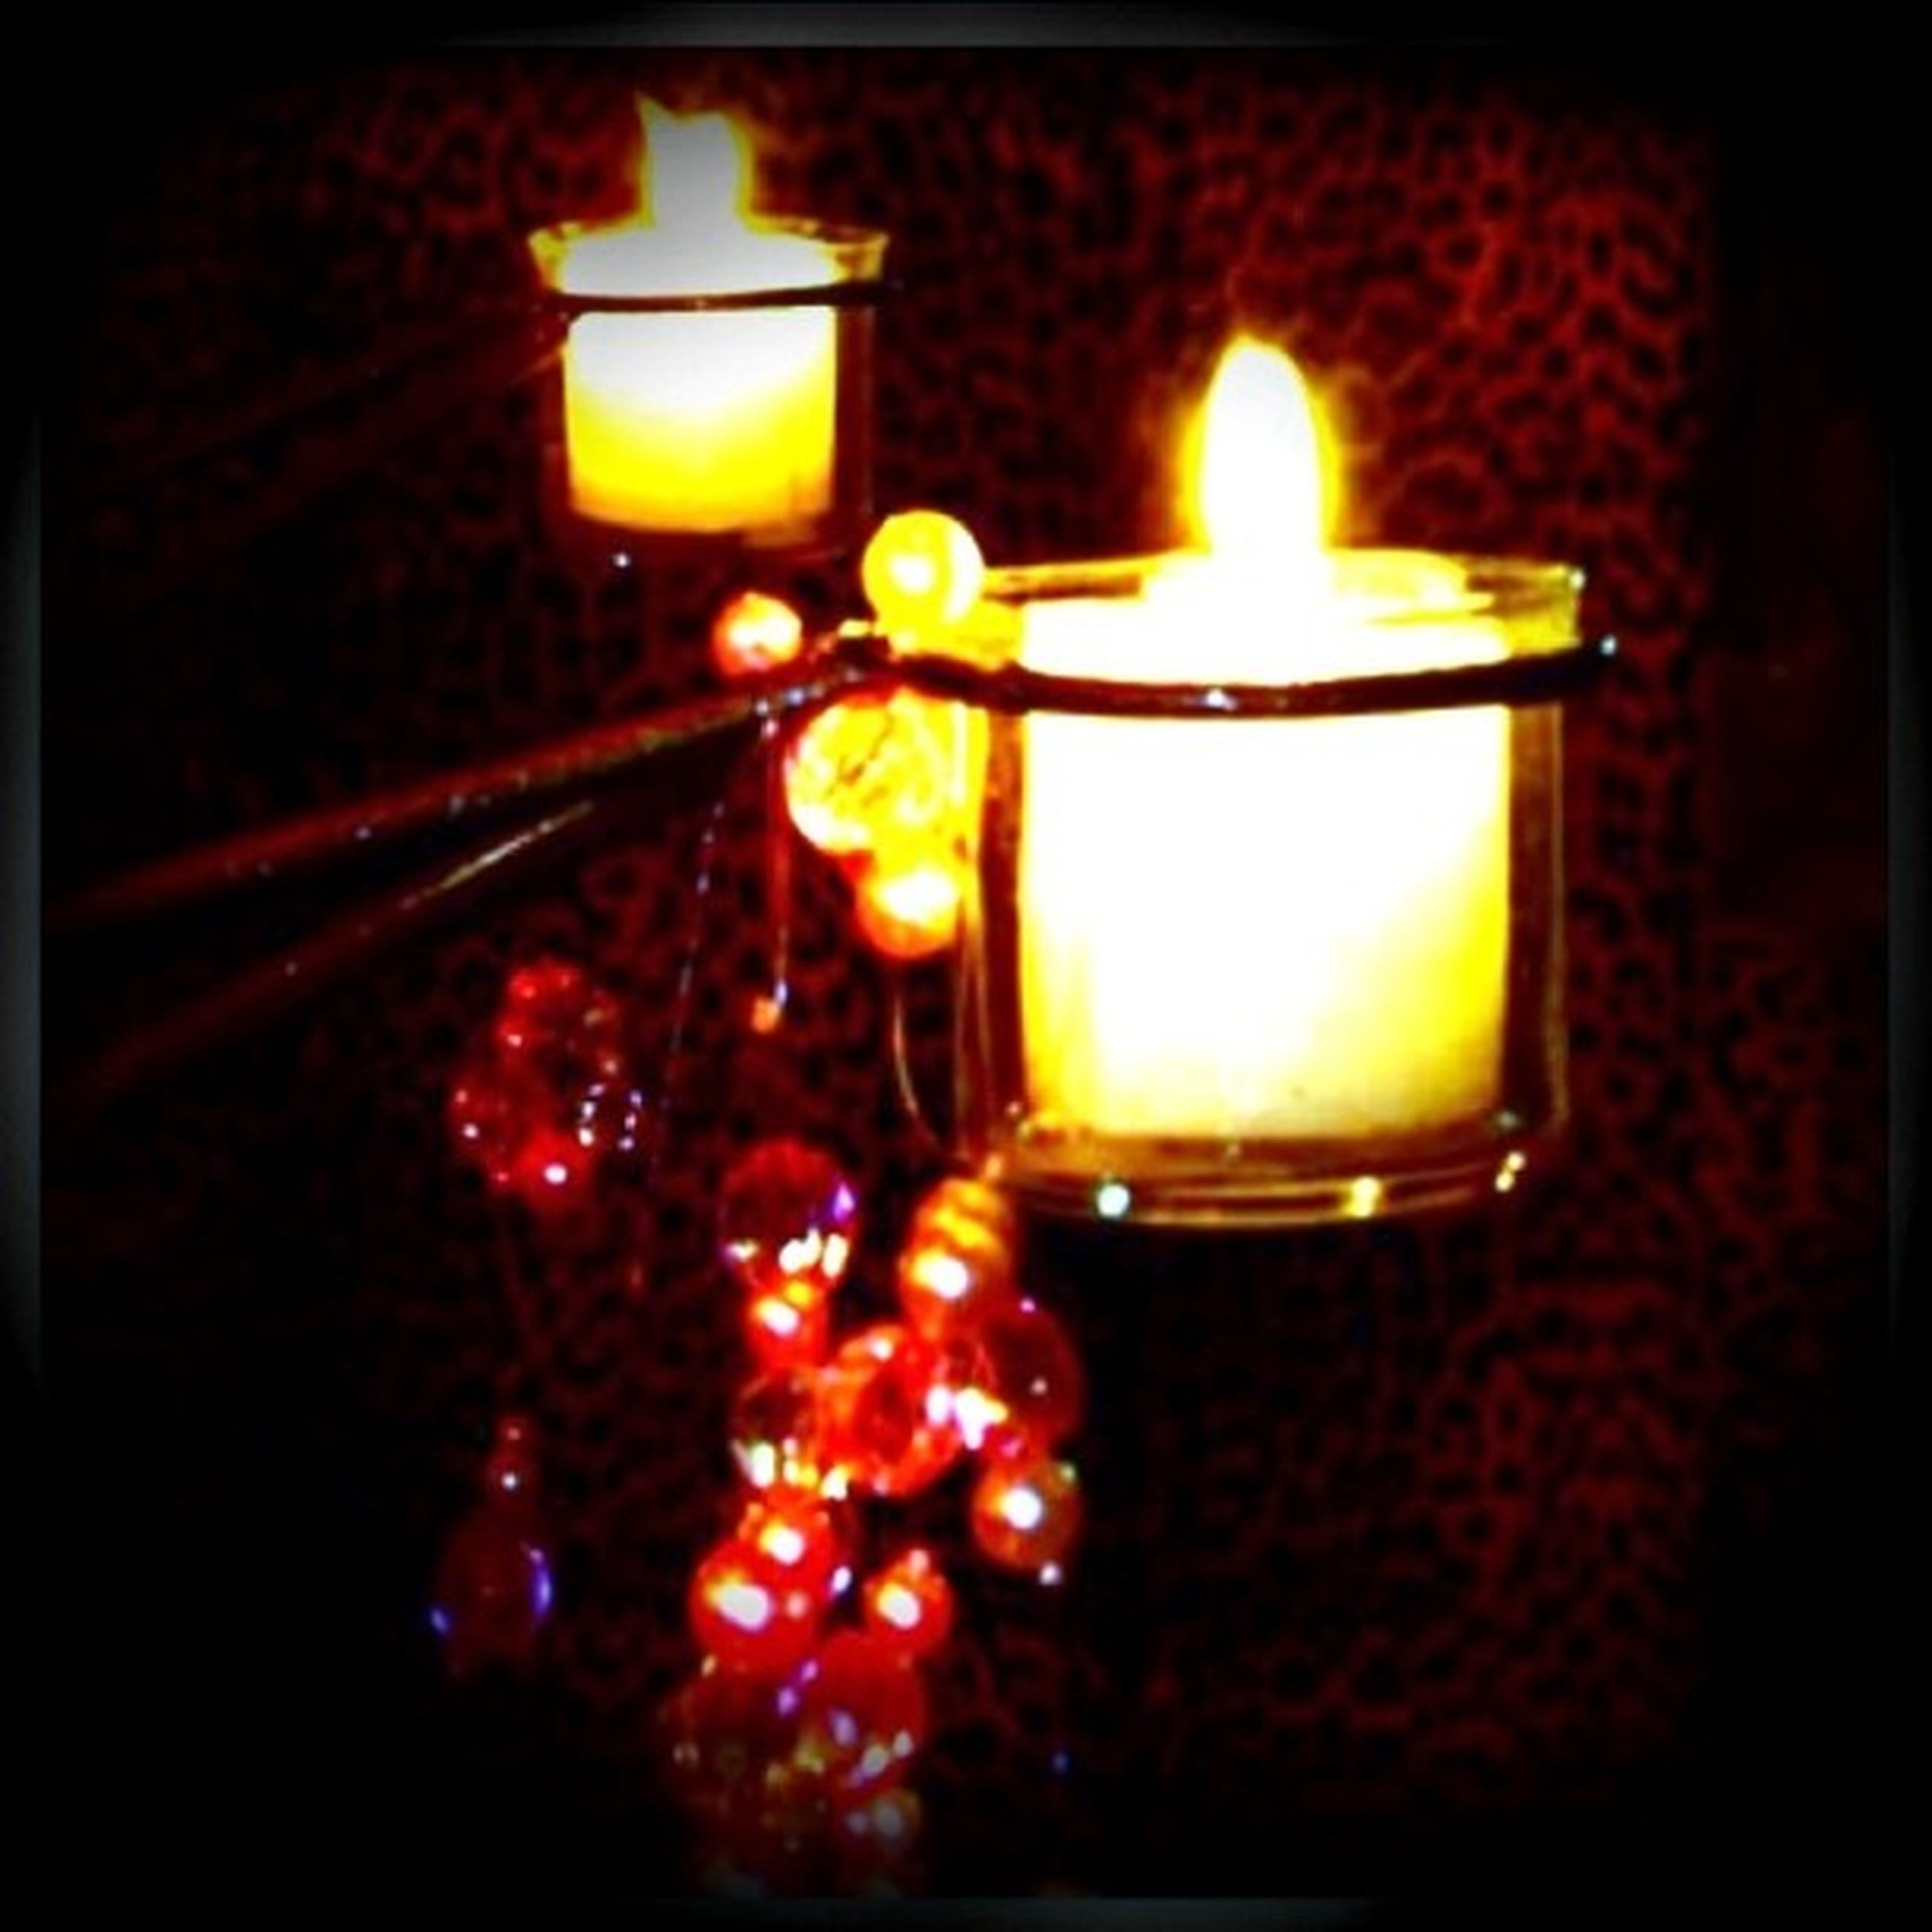 illuminated, lighting equipment, glowing, candle, lit, indoors, flame, burning, night, electricity, decoration, fire - natural phenomenon, close-up, light - natural phenomenon, heat - temperature, light bulb, electric light, lantern, candlelight, darkroom